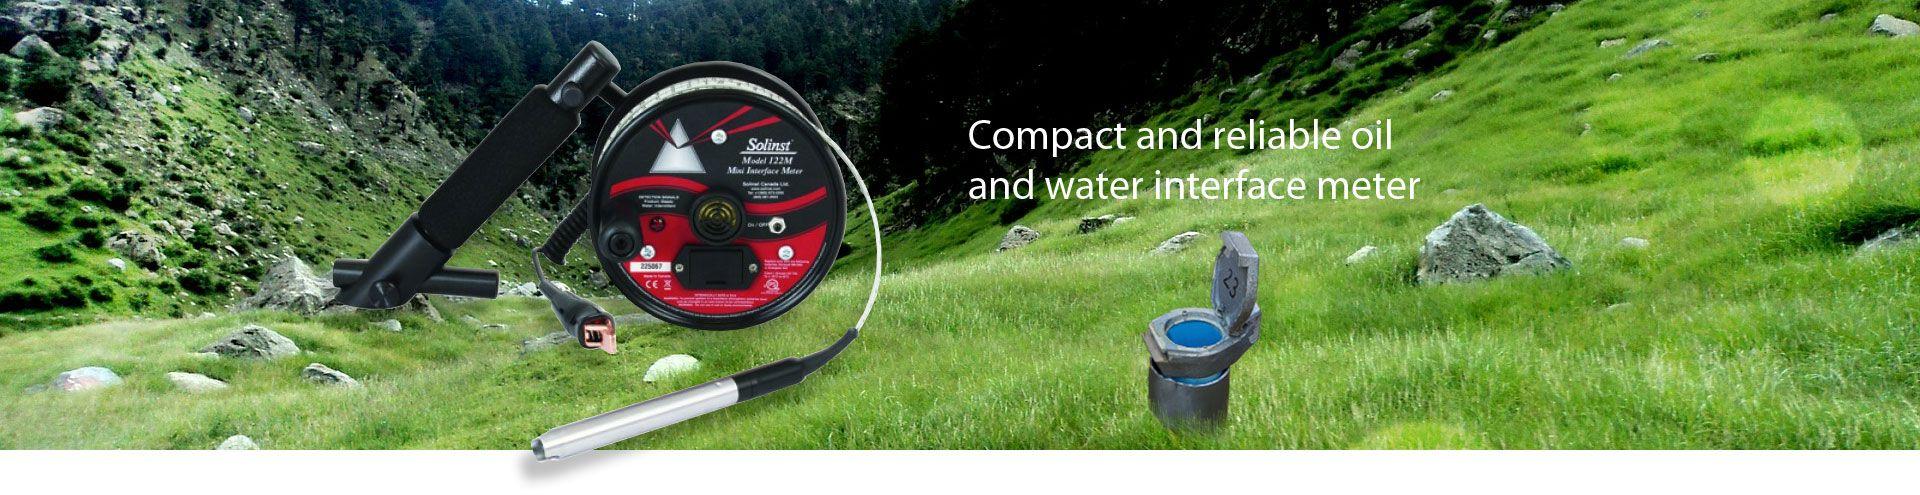 Solinst Model 122M Mini Oil/Water Interface Meters